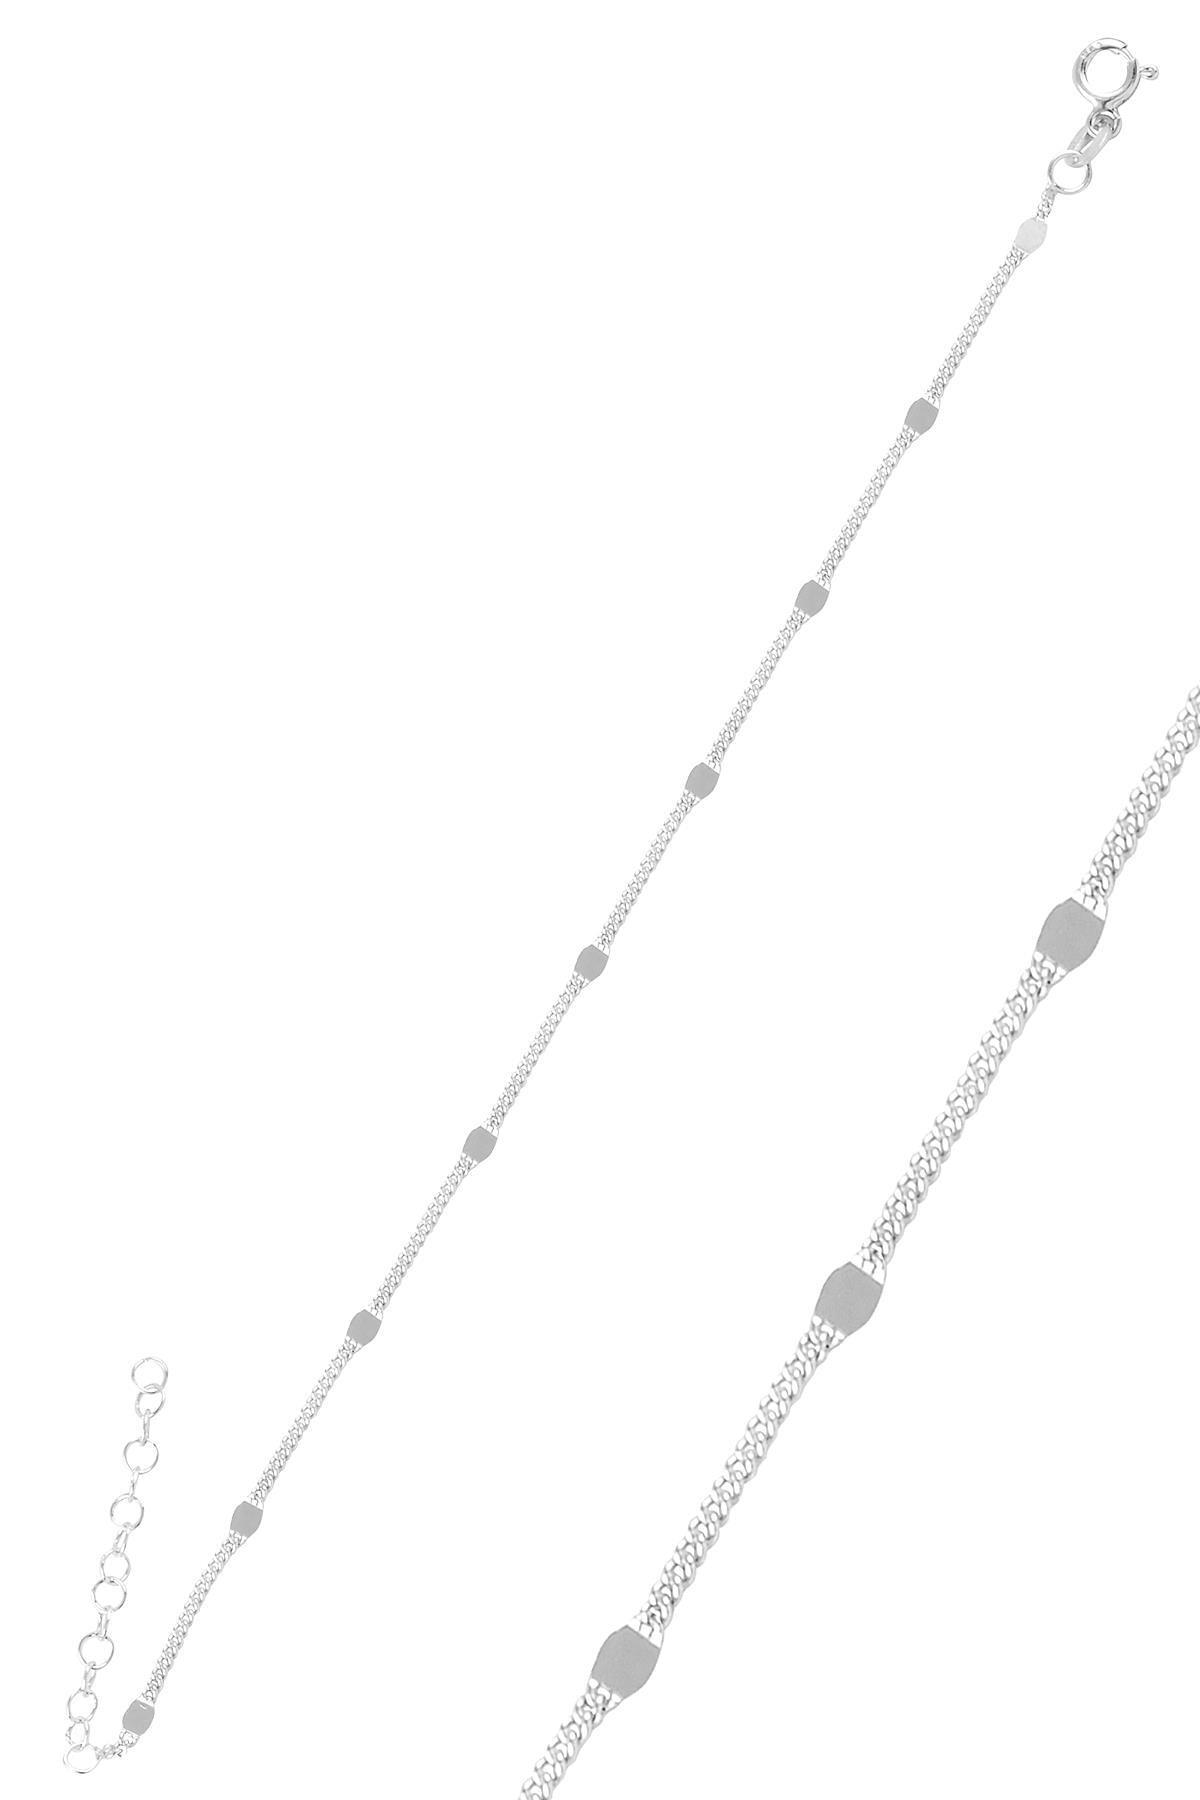 Söğütlü Silver Gümüş Rodyumlu  Pullu Gurmet  Zincir Bileklik